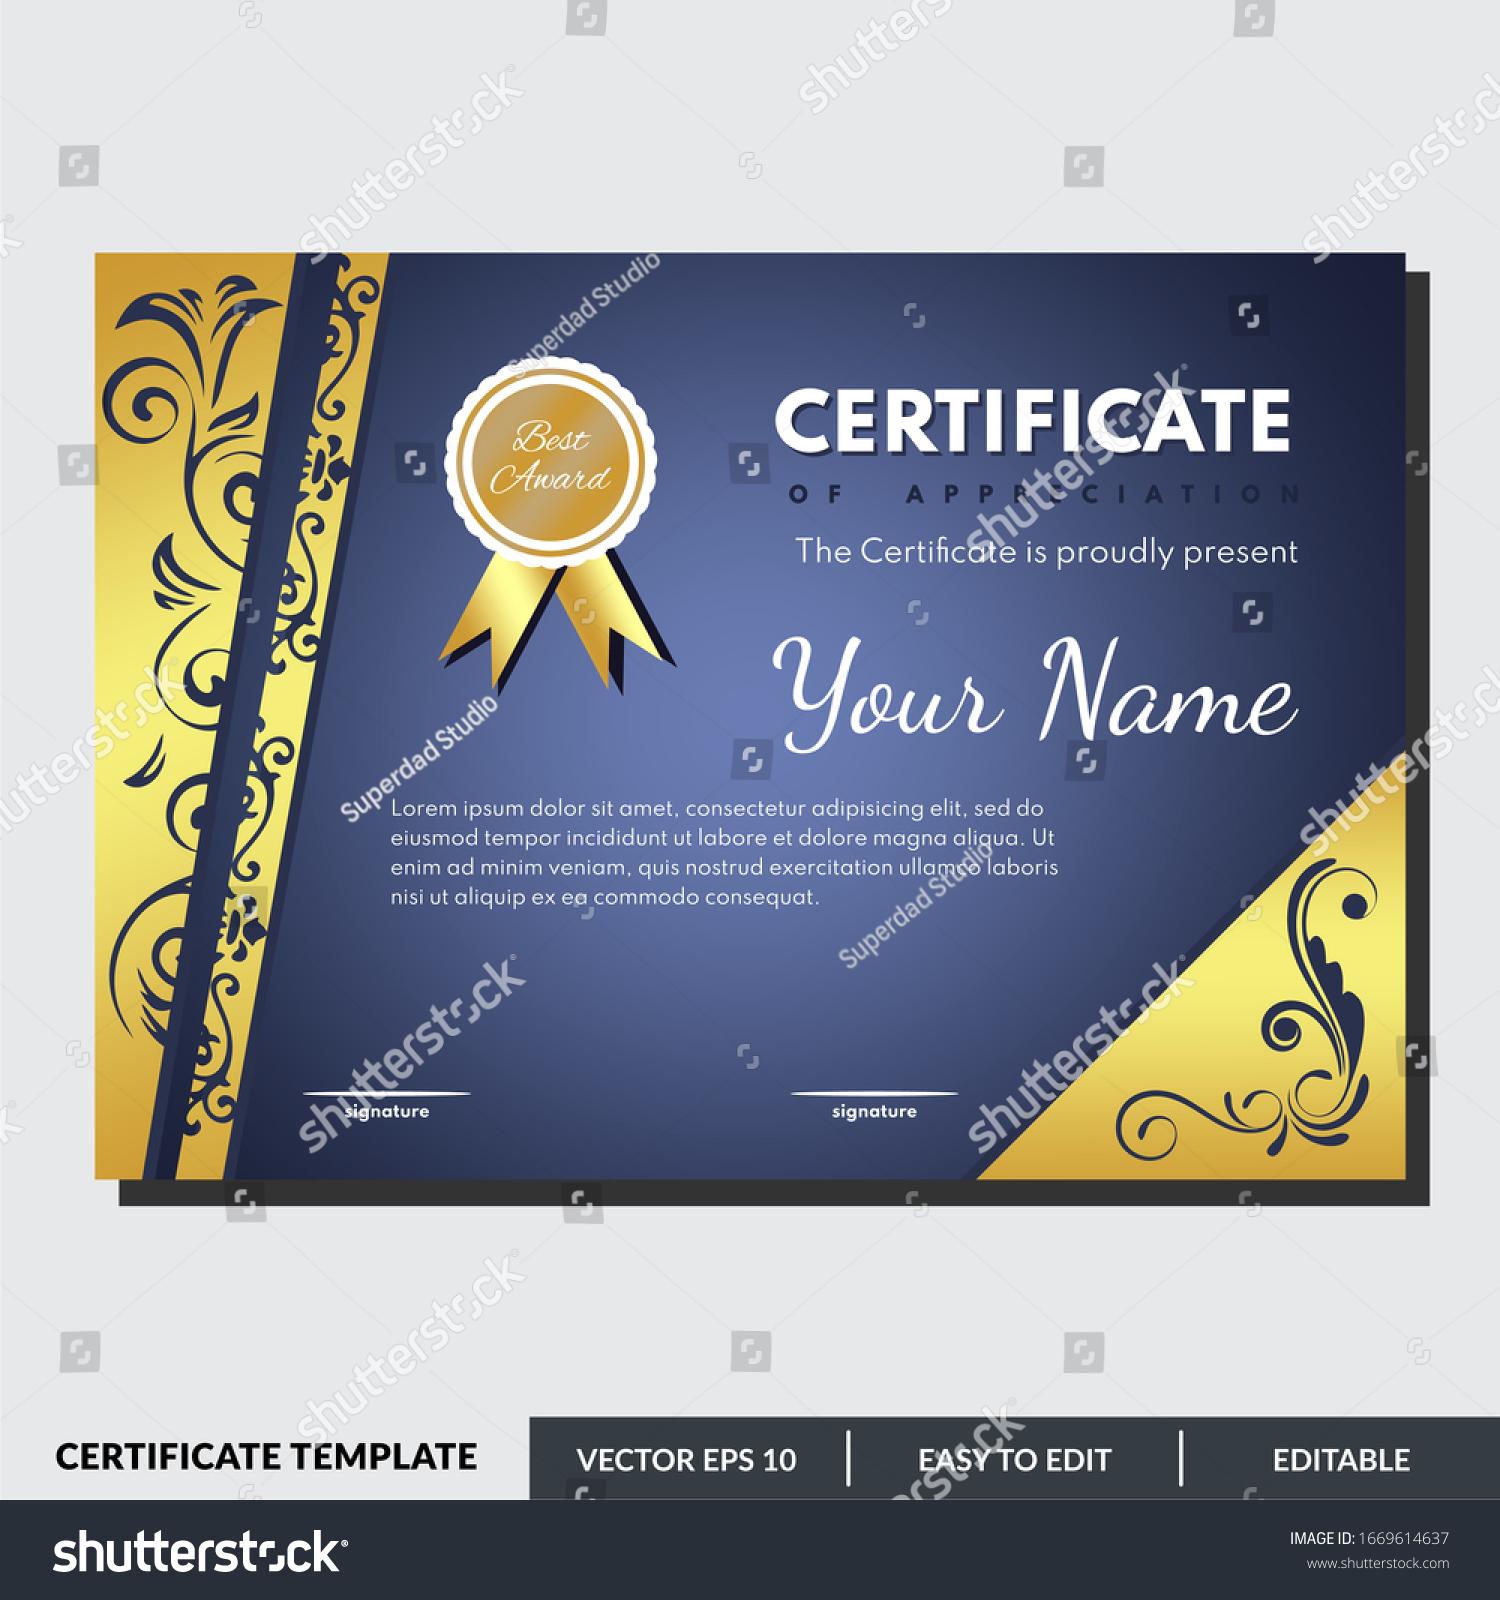 Modern Certificate Template Appreciation Award Creative Stock With Award Certificate Design Template